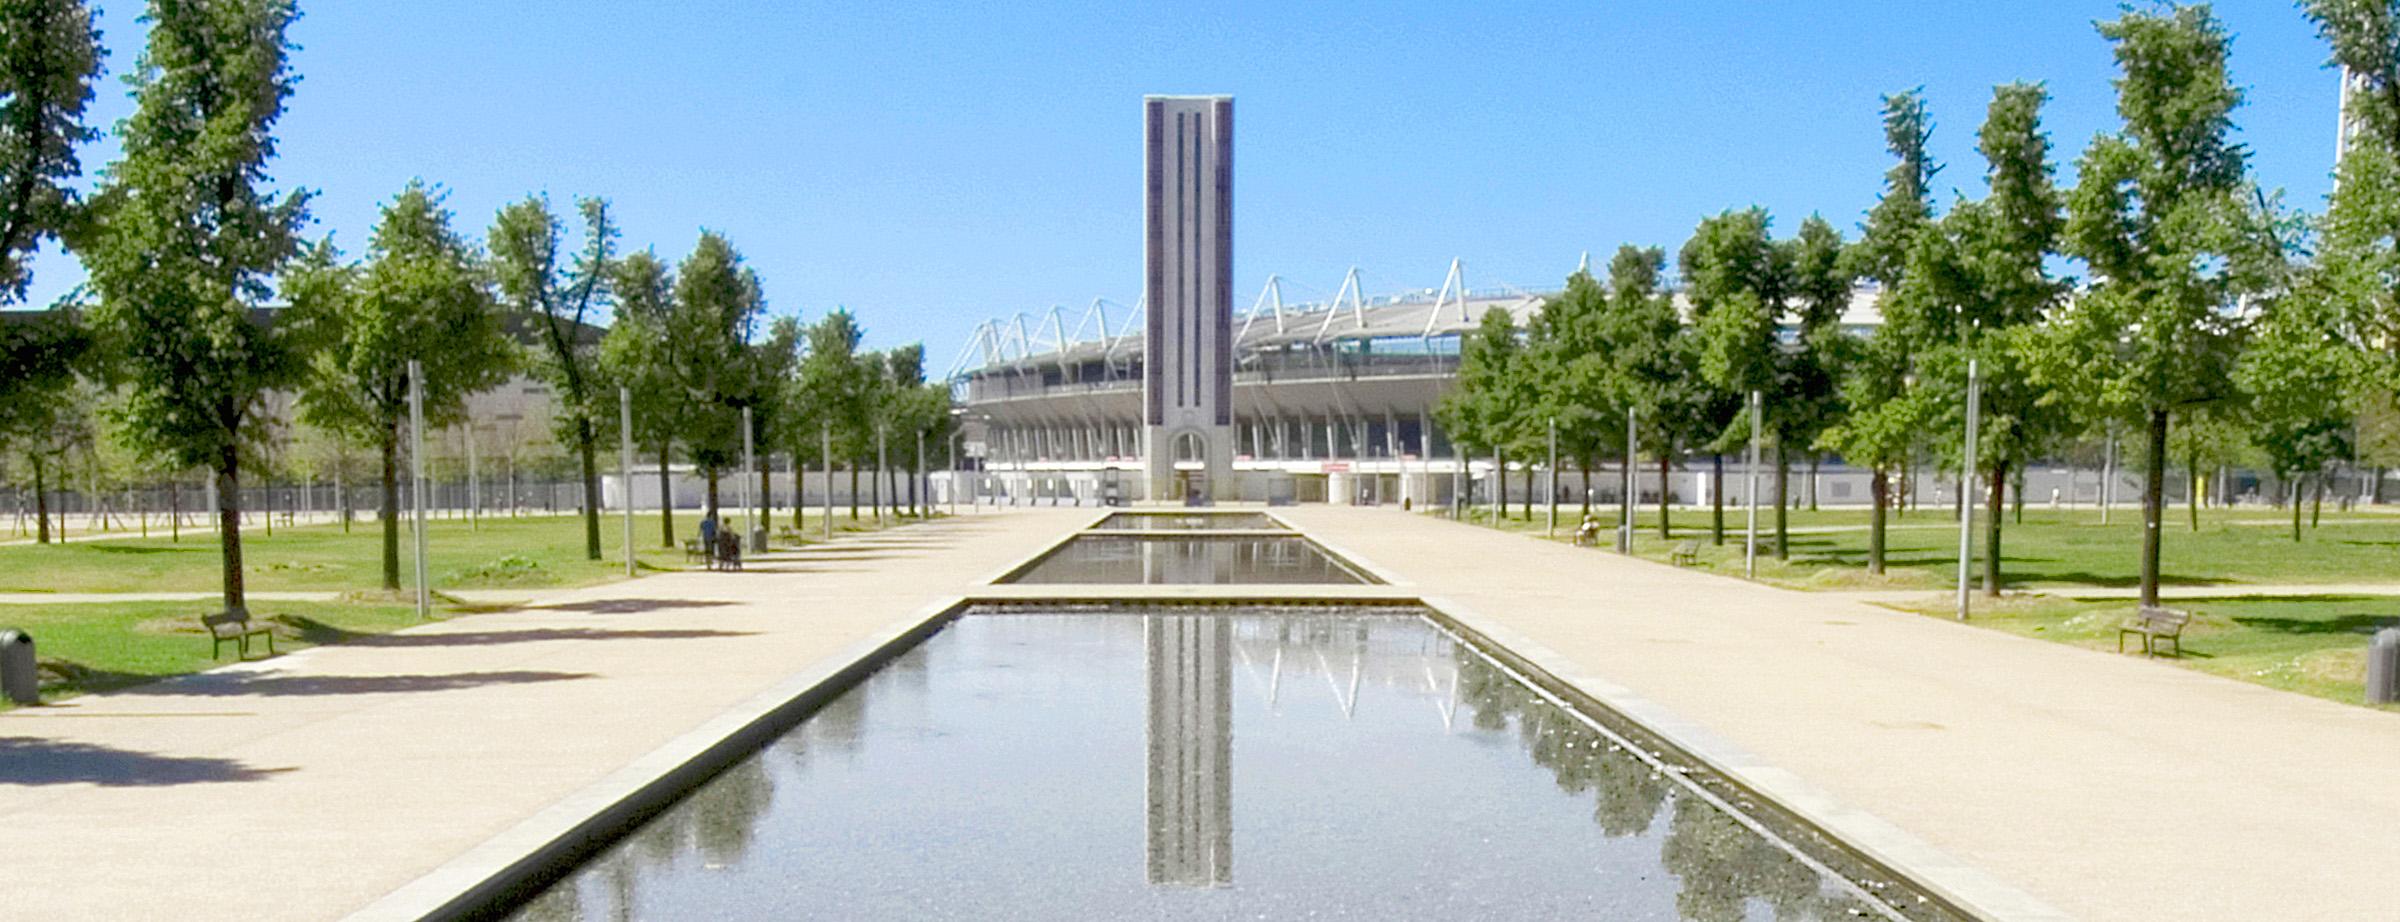 Parco Piazza d'Armi – XX Olympic Winter Games